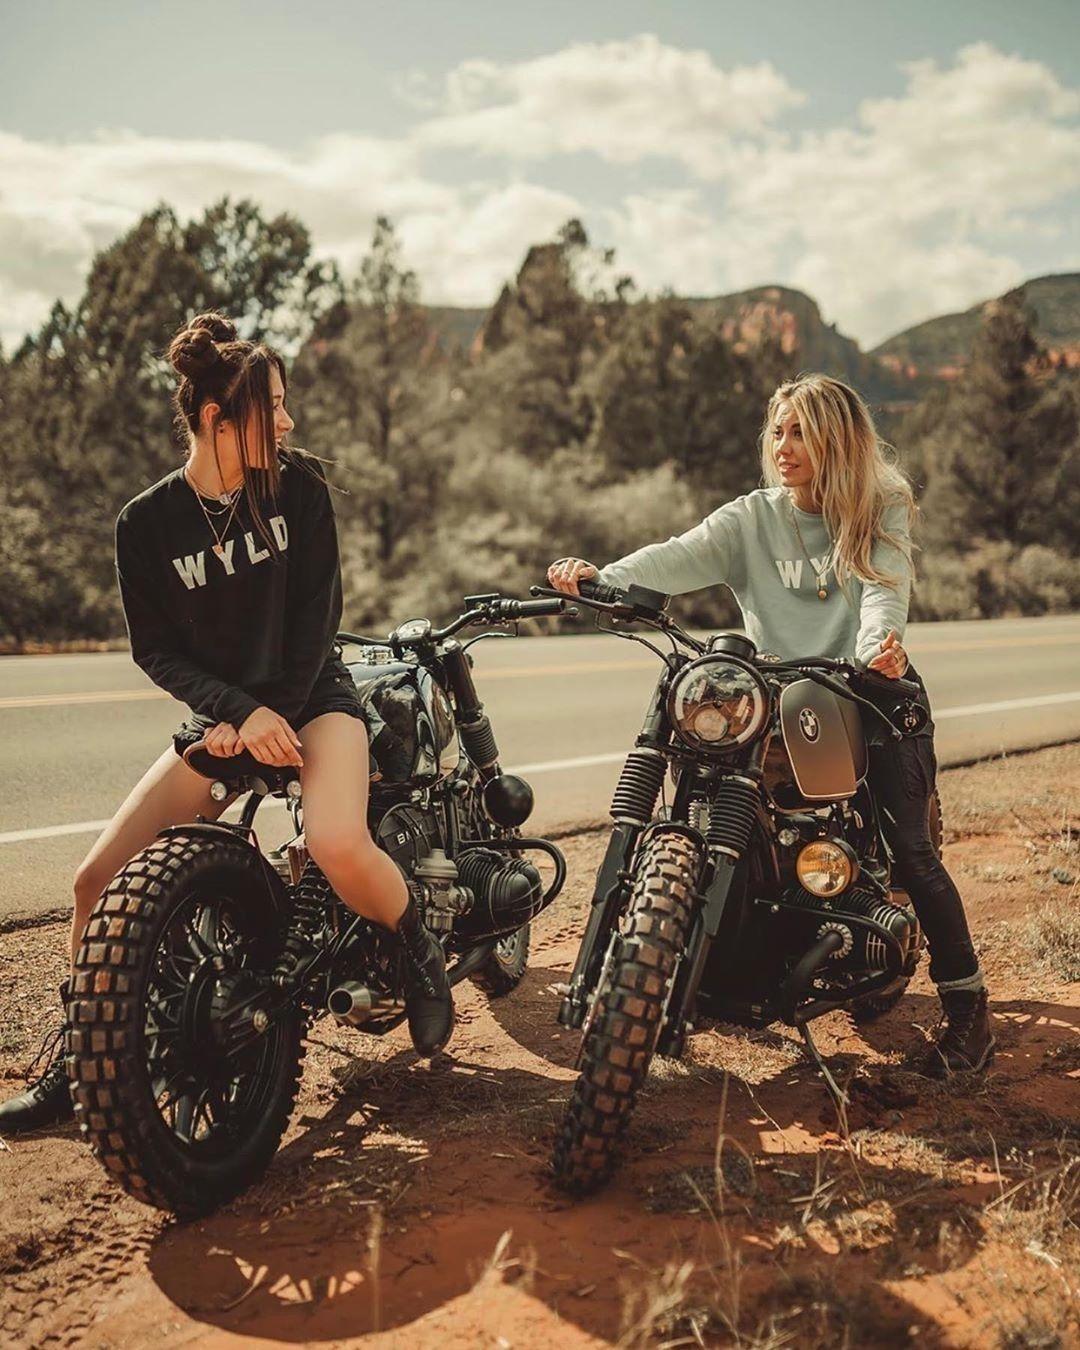 "Best bikes & beautiful Girls's Instagram post: ""@ari.gonzo & @ruka.co⠀ ✨ 🄰🄼🄰🅉🄸🄽🄶 😍 #bikegirl ♀️🏍 #motolady 💨 📸 🄱🅈 🅃🄰🄻🄰🄽🅃🄴🄳 @justinwadeorton⠀ 👍 🄲🅄🅂🅃🄾🄼🄼🄾🅃🄾 ➡️ @wyldgarage 👍 🄵🄾🄻🄻🄾🅆 🔽 🛵👸…"""